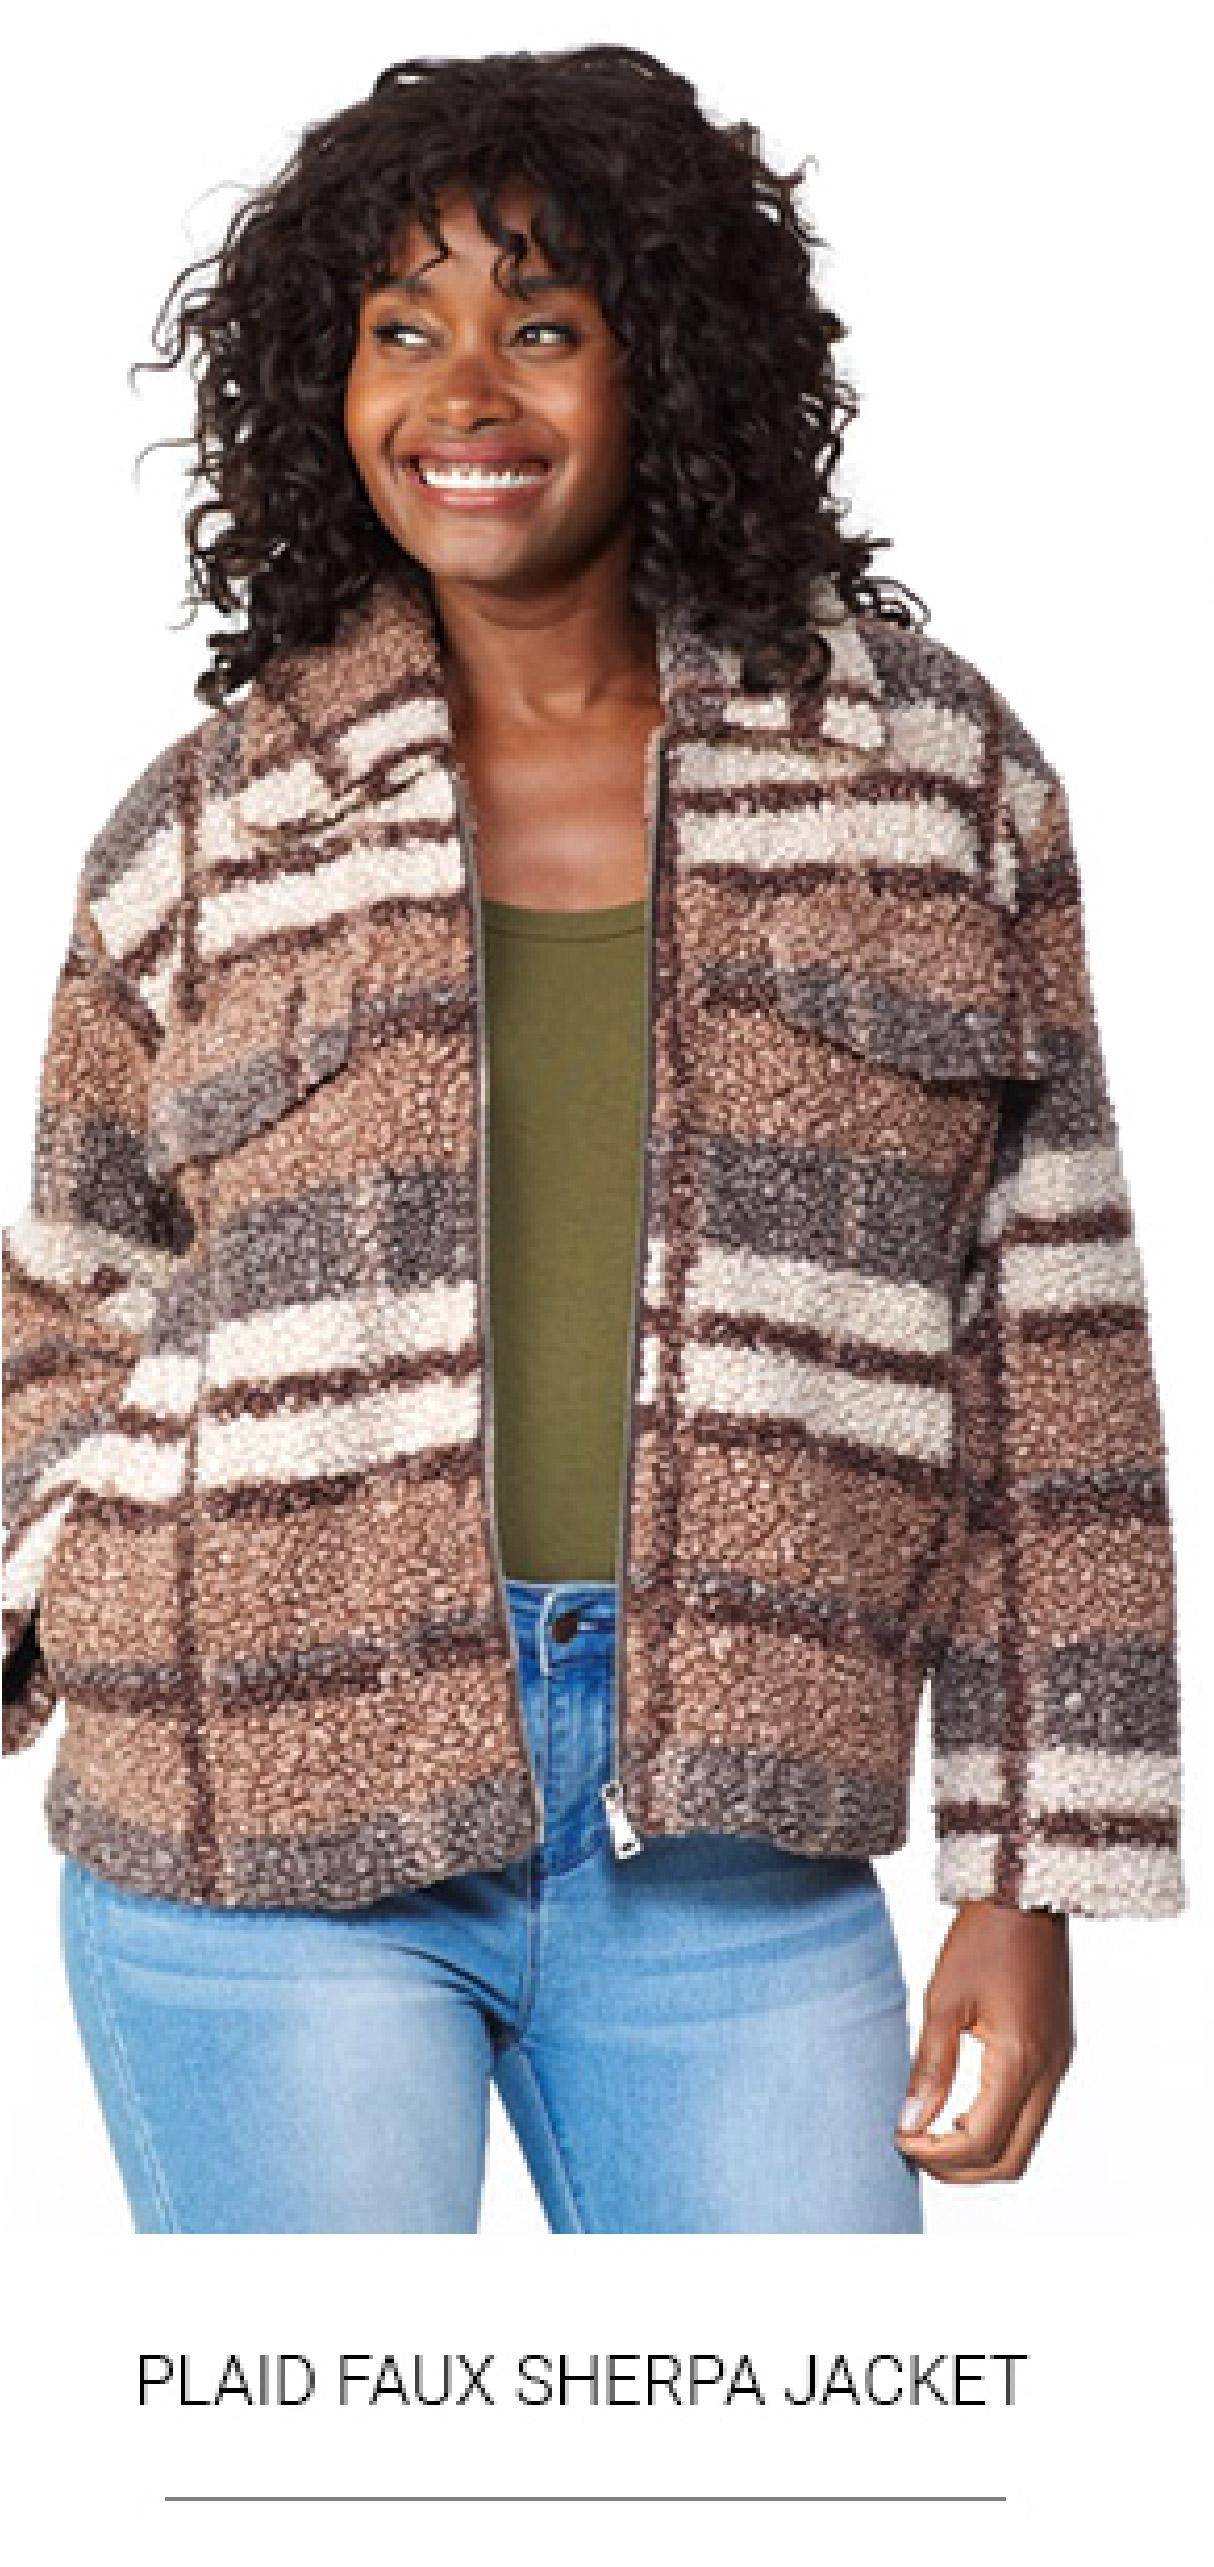 Plaid Faux Sherpa Jacket